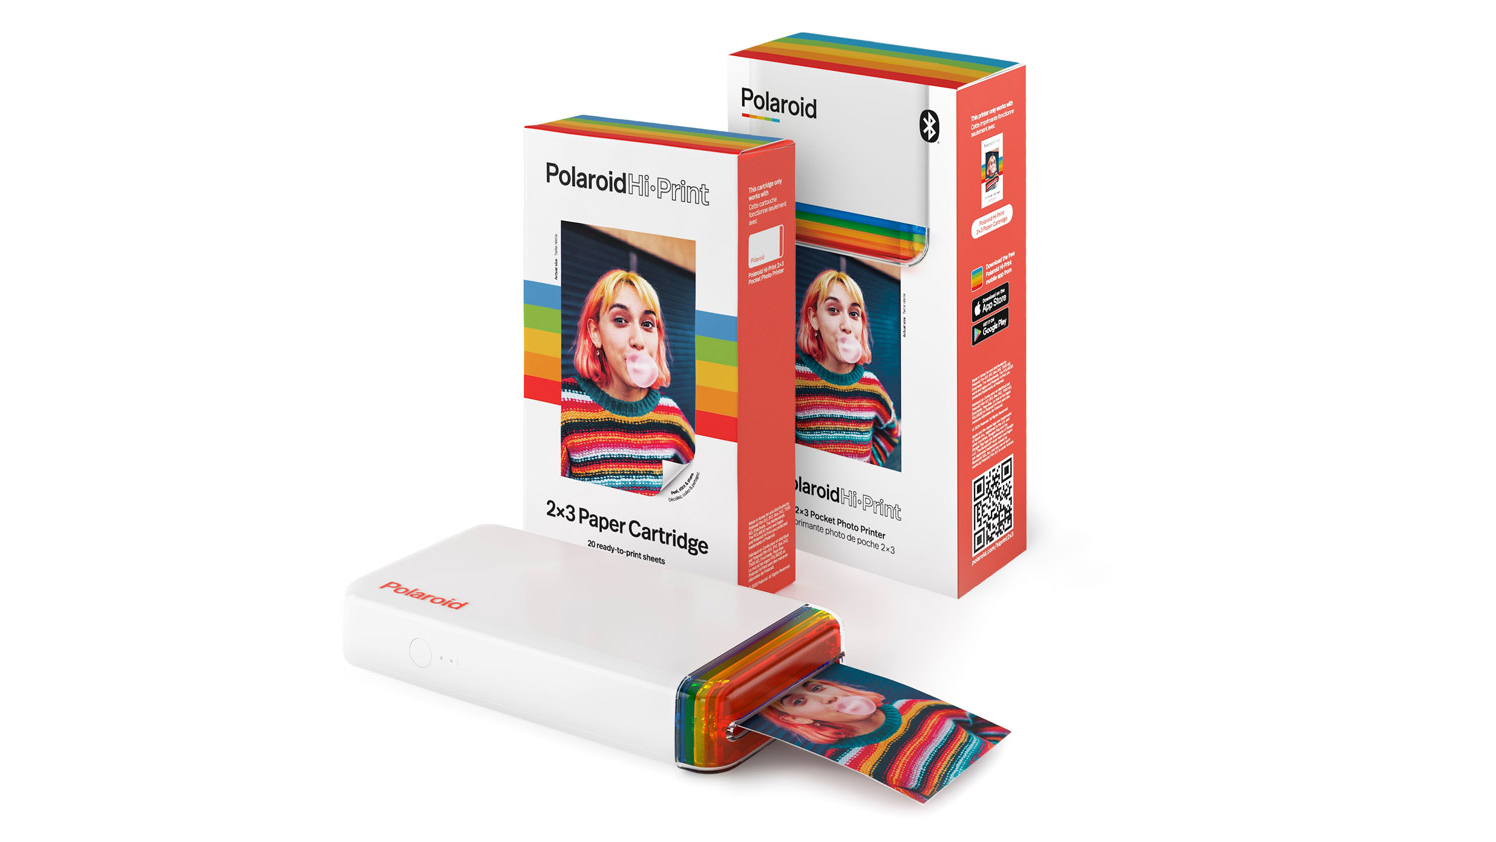 Polaroid Introduces Portable Instant Photo Printer TechRechard